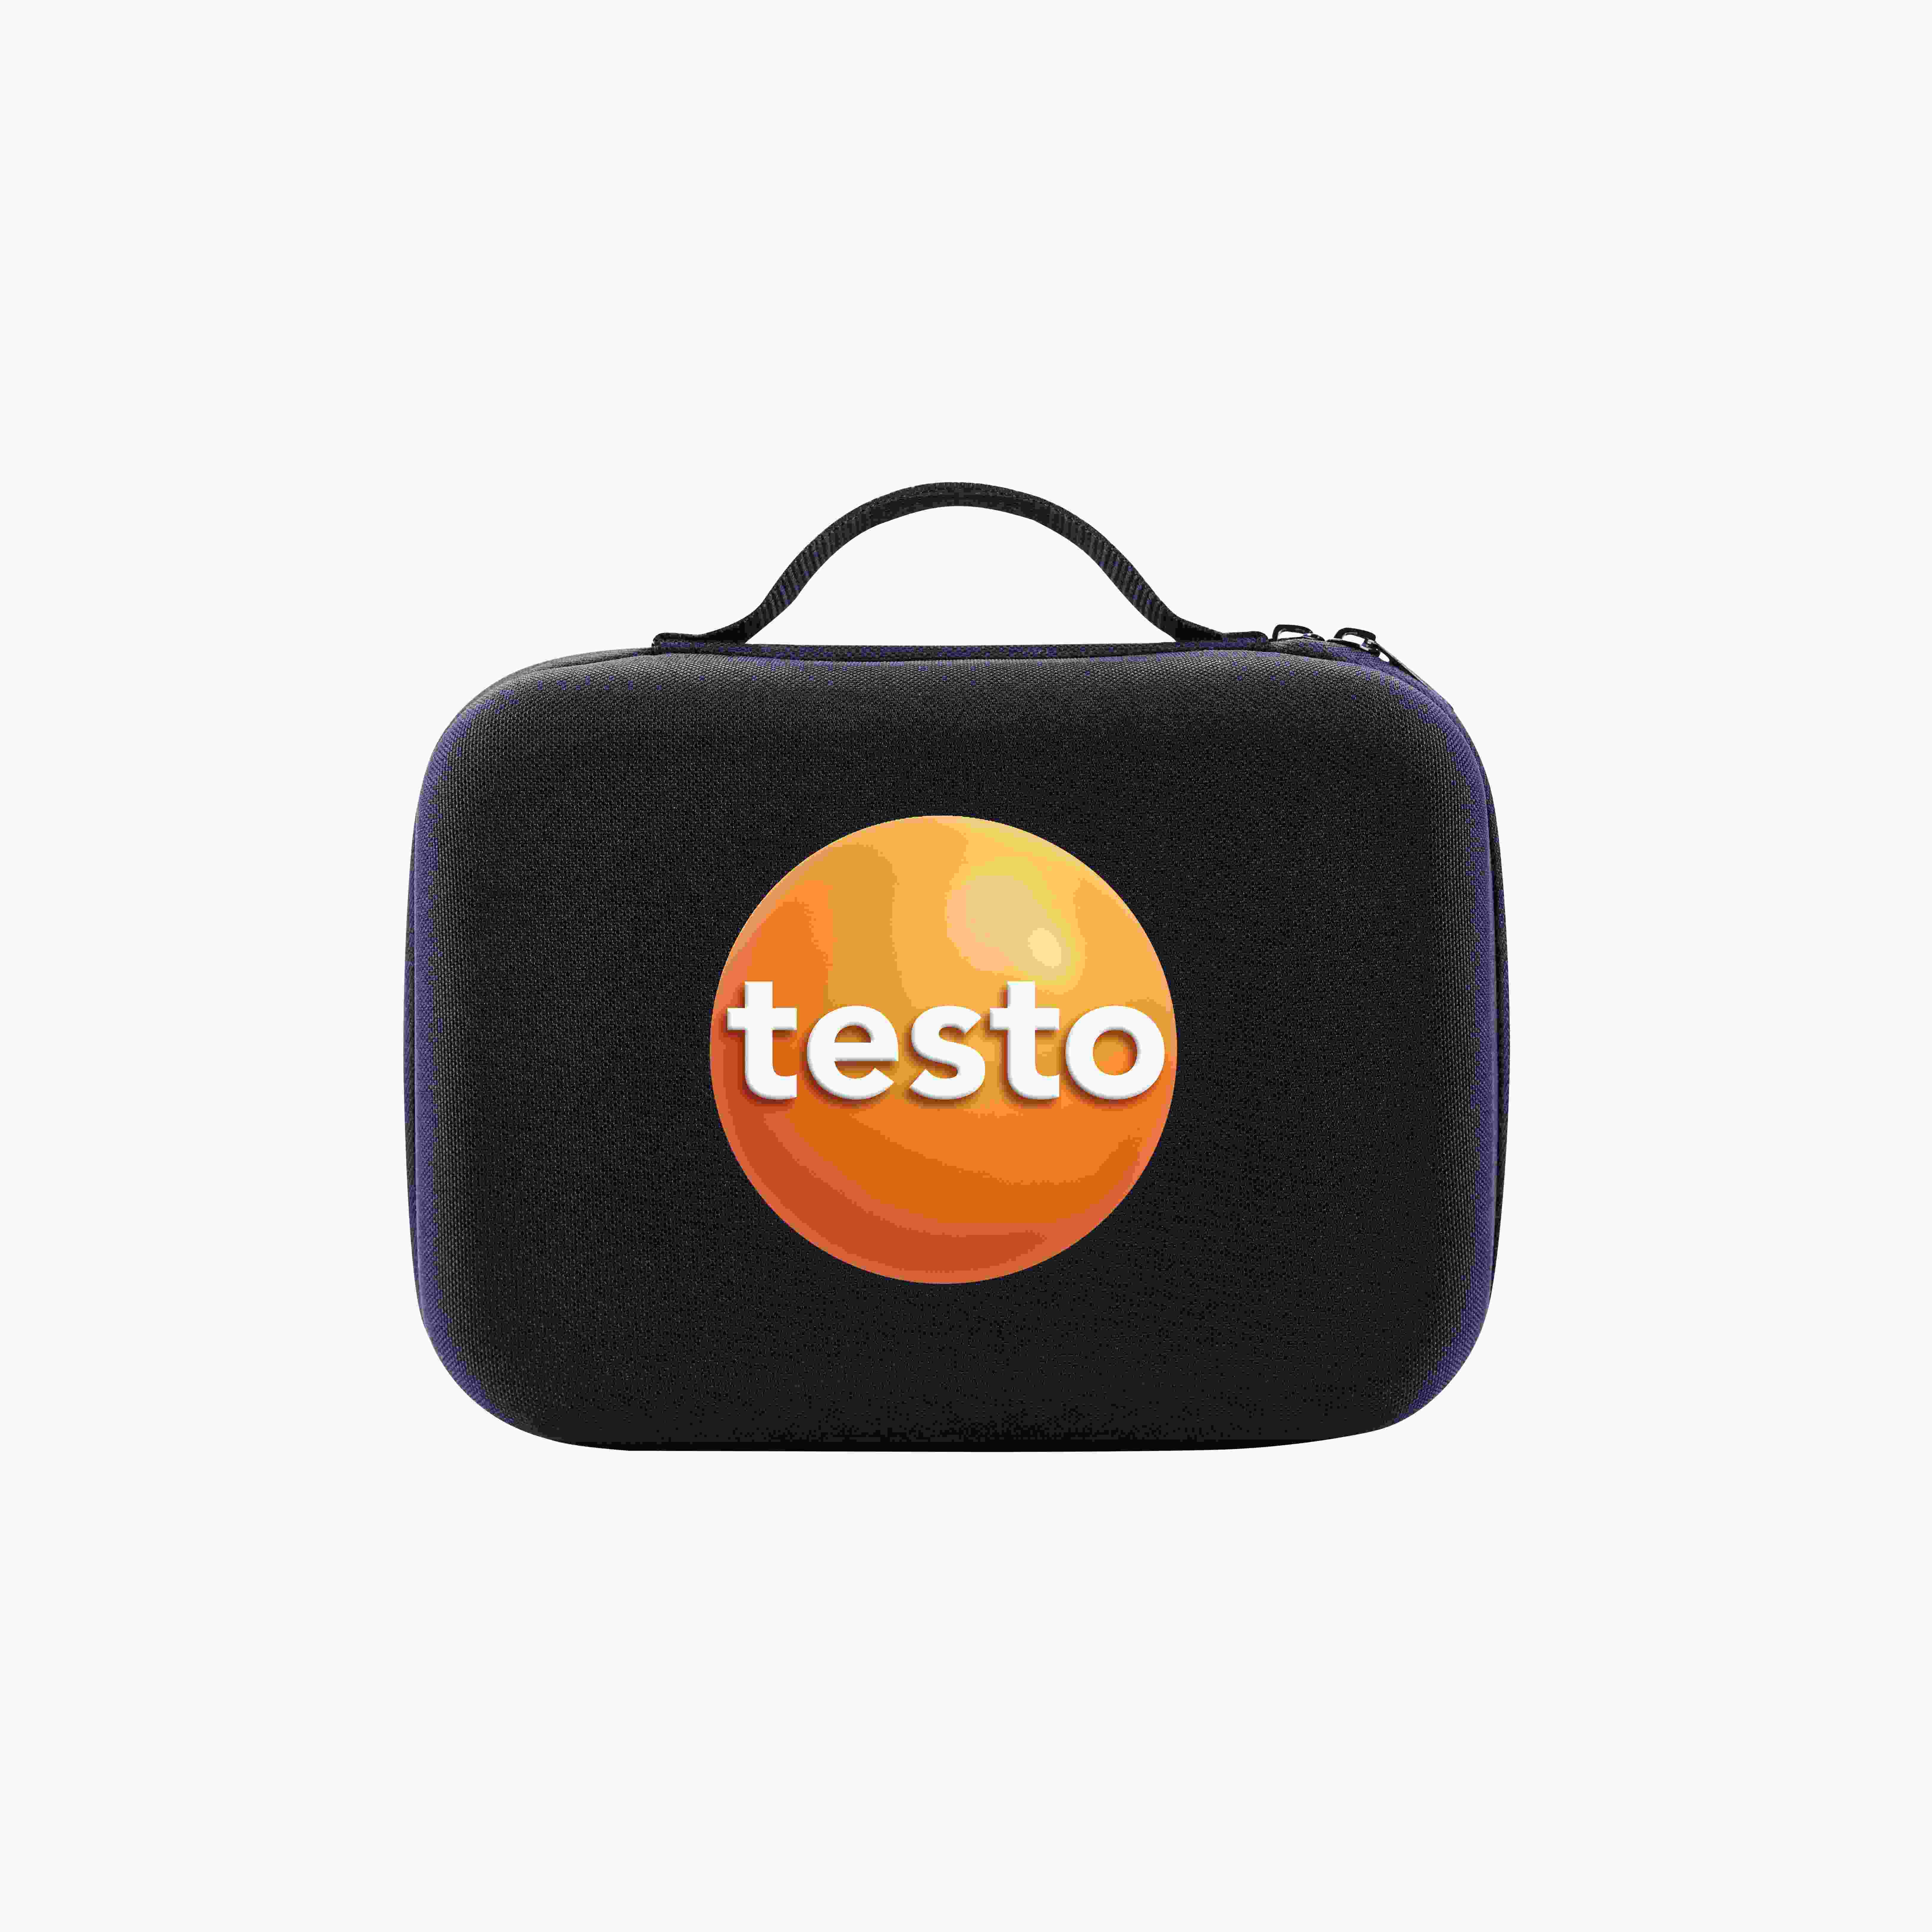 0516-0240-0516-0270-testo-smart-probes-set-refrigeration-heating